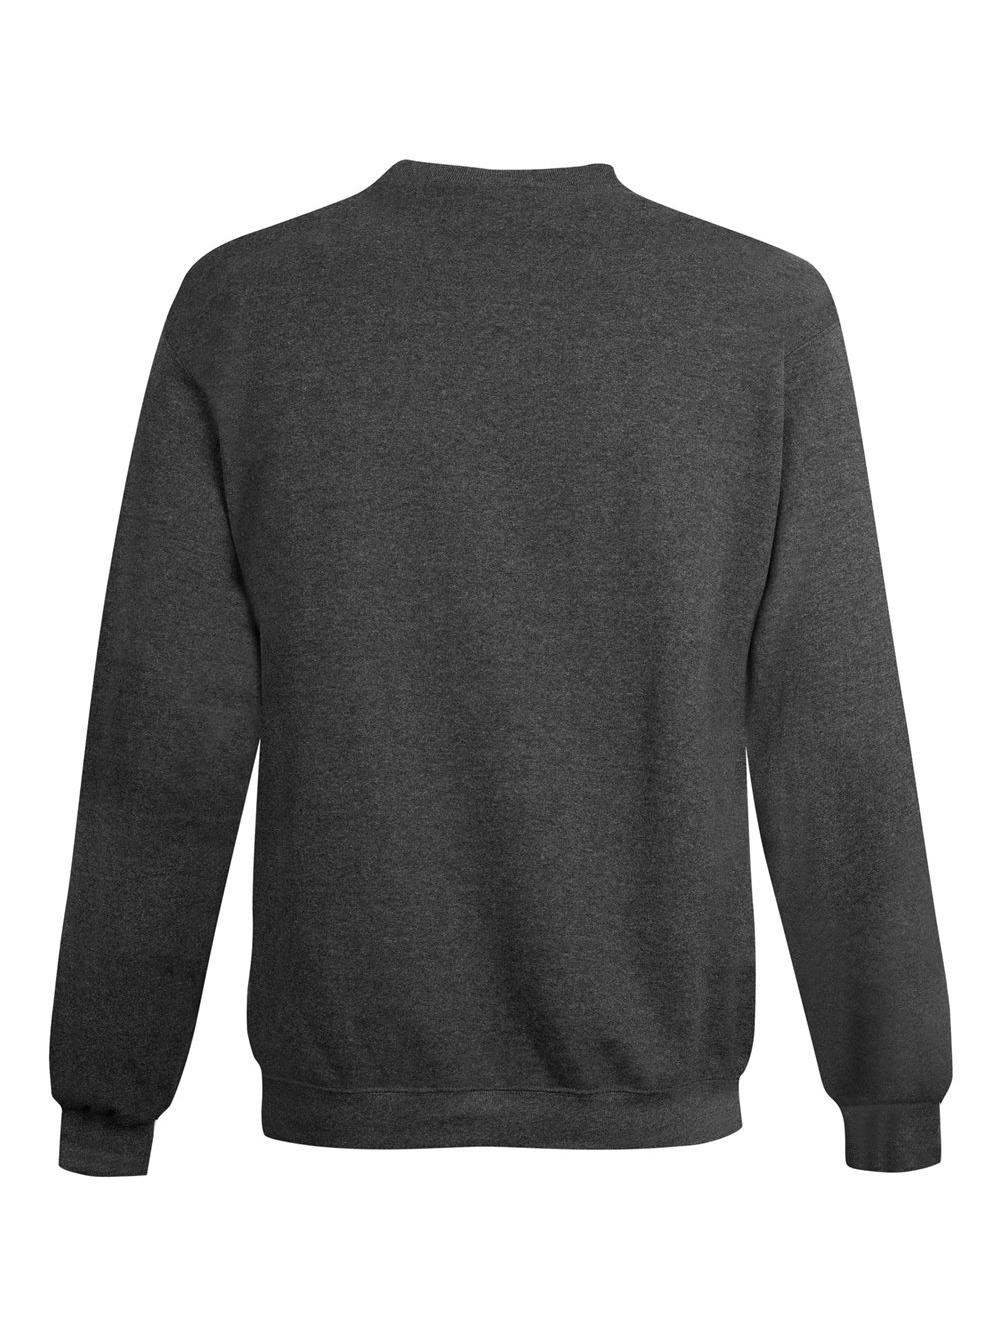 Champion-Double-Dry-Eco-Crewneck-Sweatshirt-S600 thumbnail 7